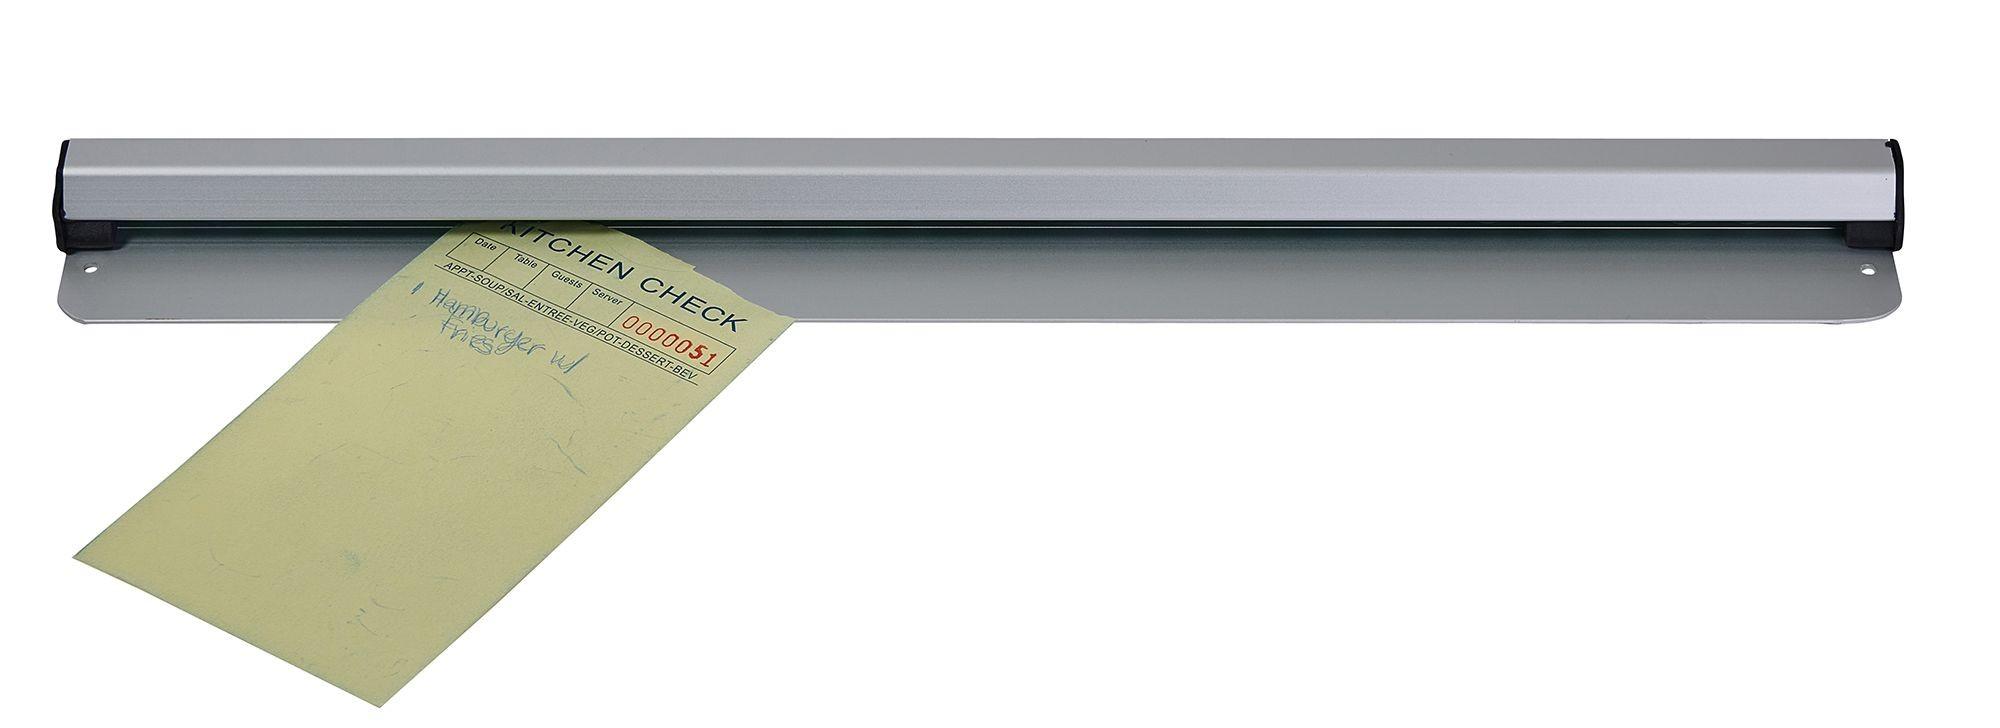 "Winco ODR-18N 18"" Aluminum Order Rack"